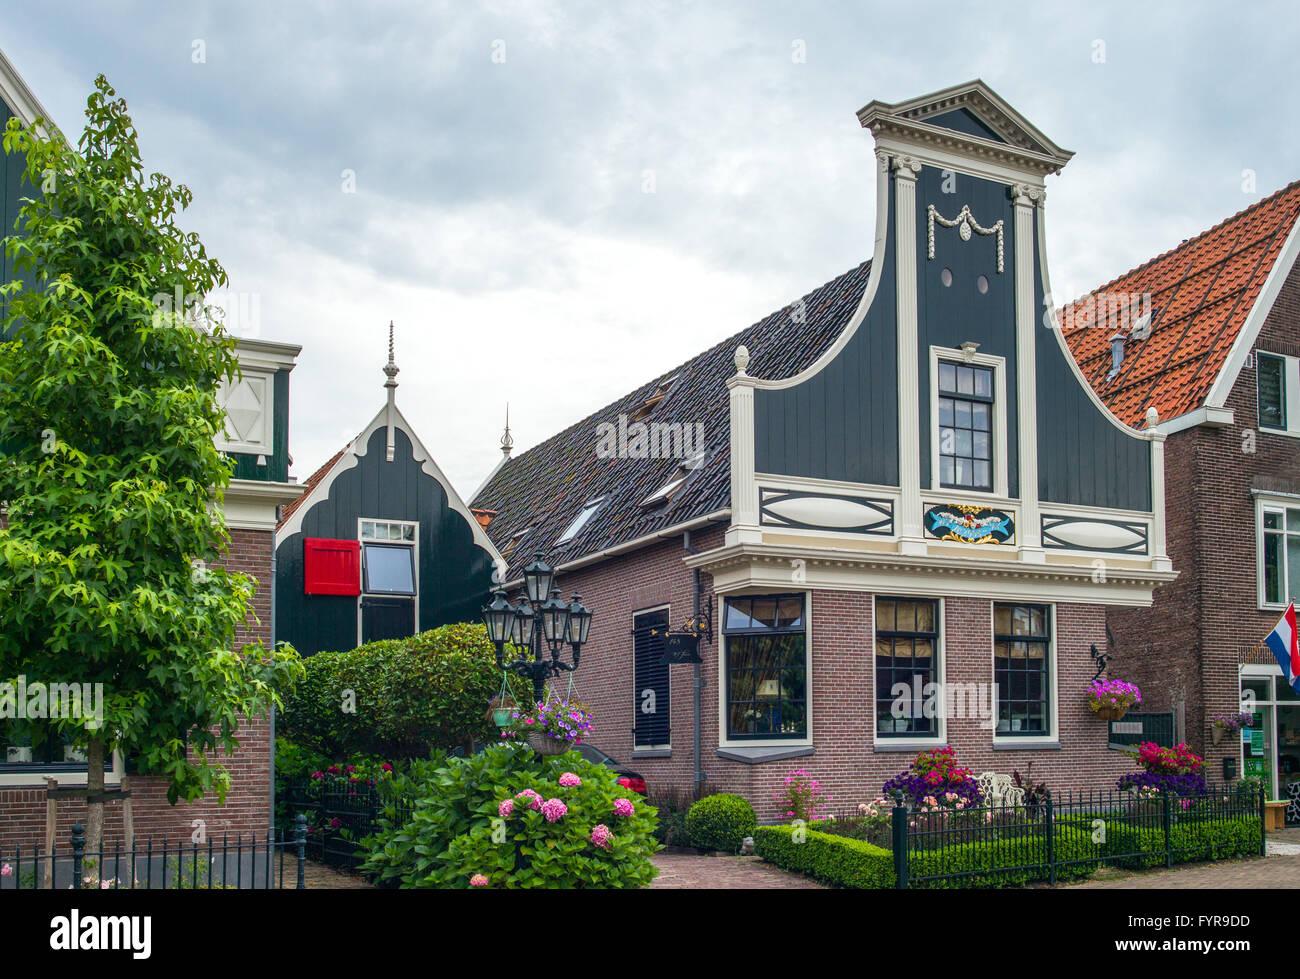 Amsterdam, Waterland district, Zaandam, typical houses Stock Photo